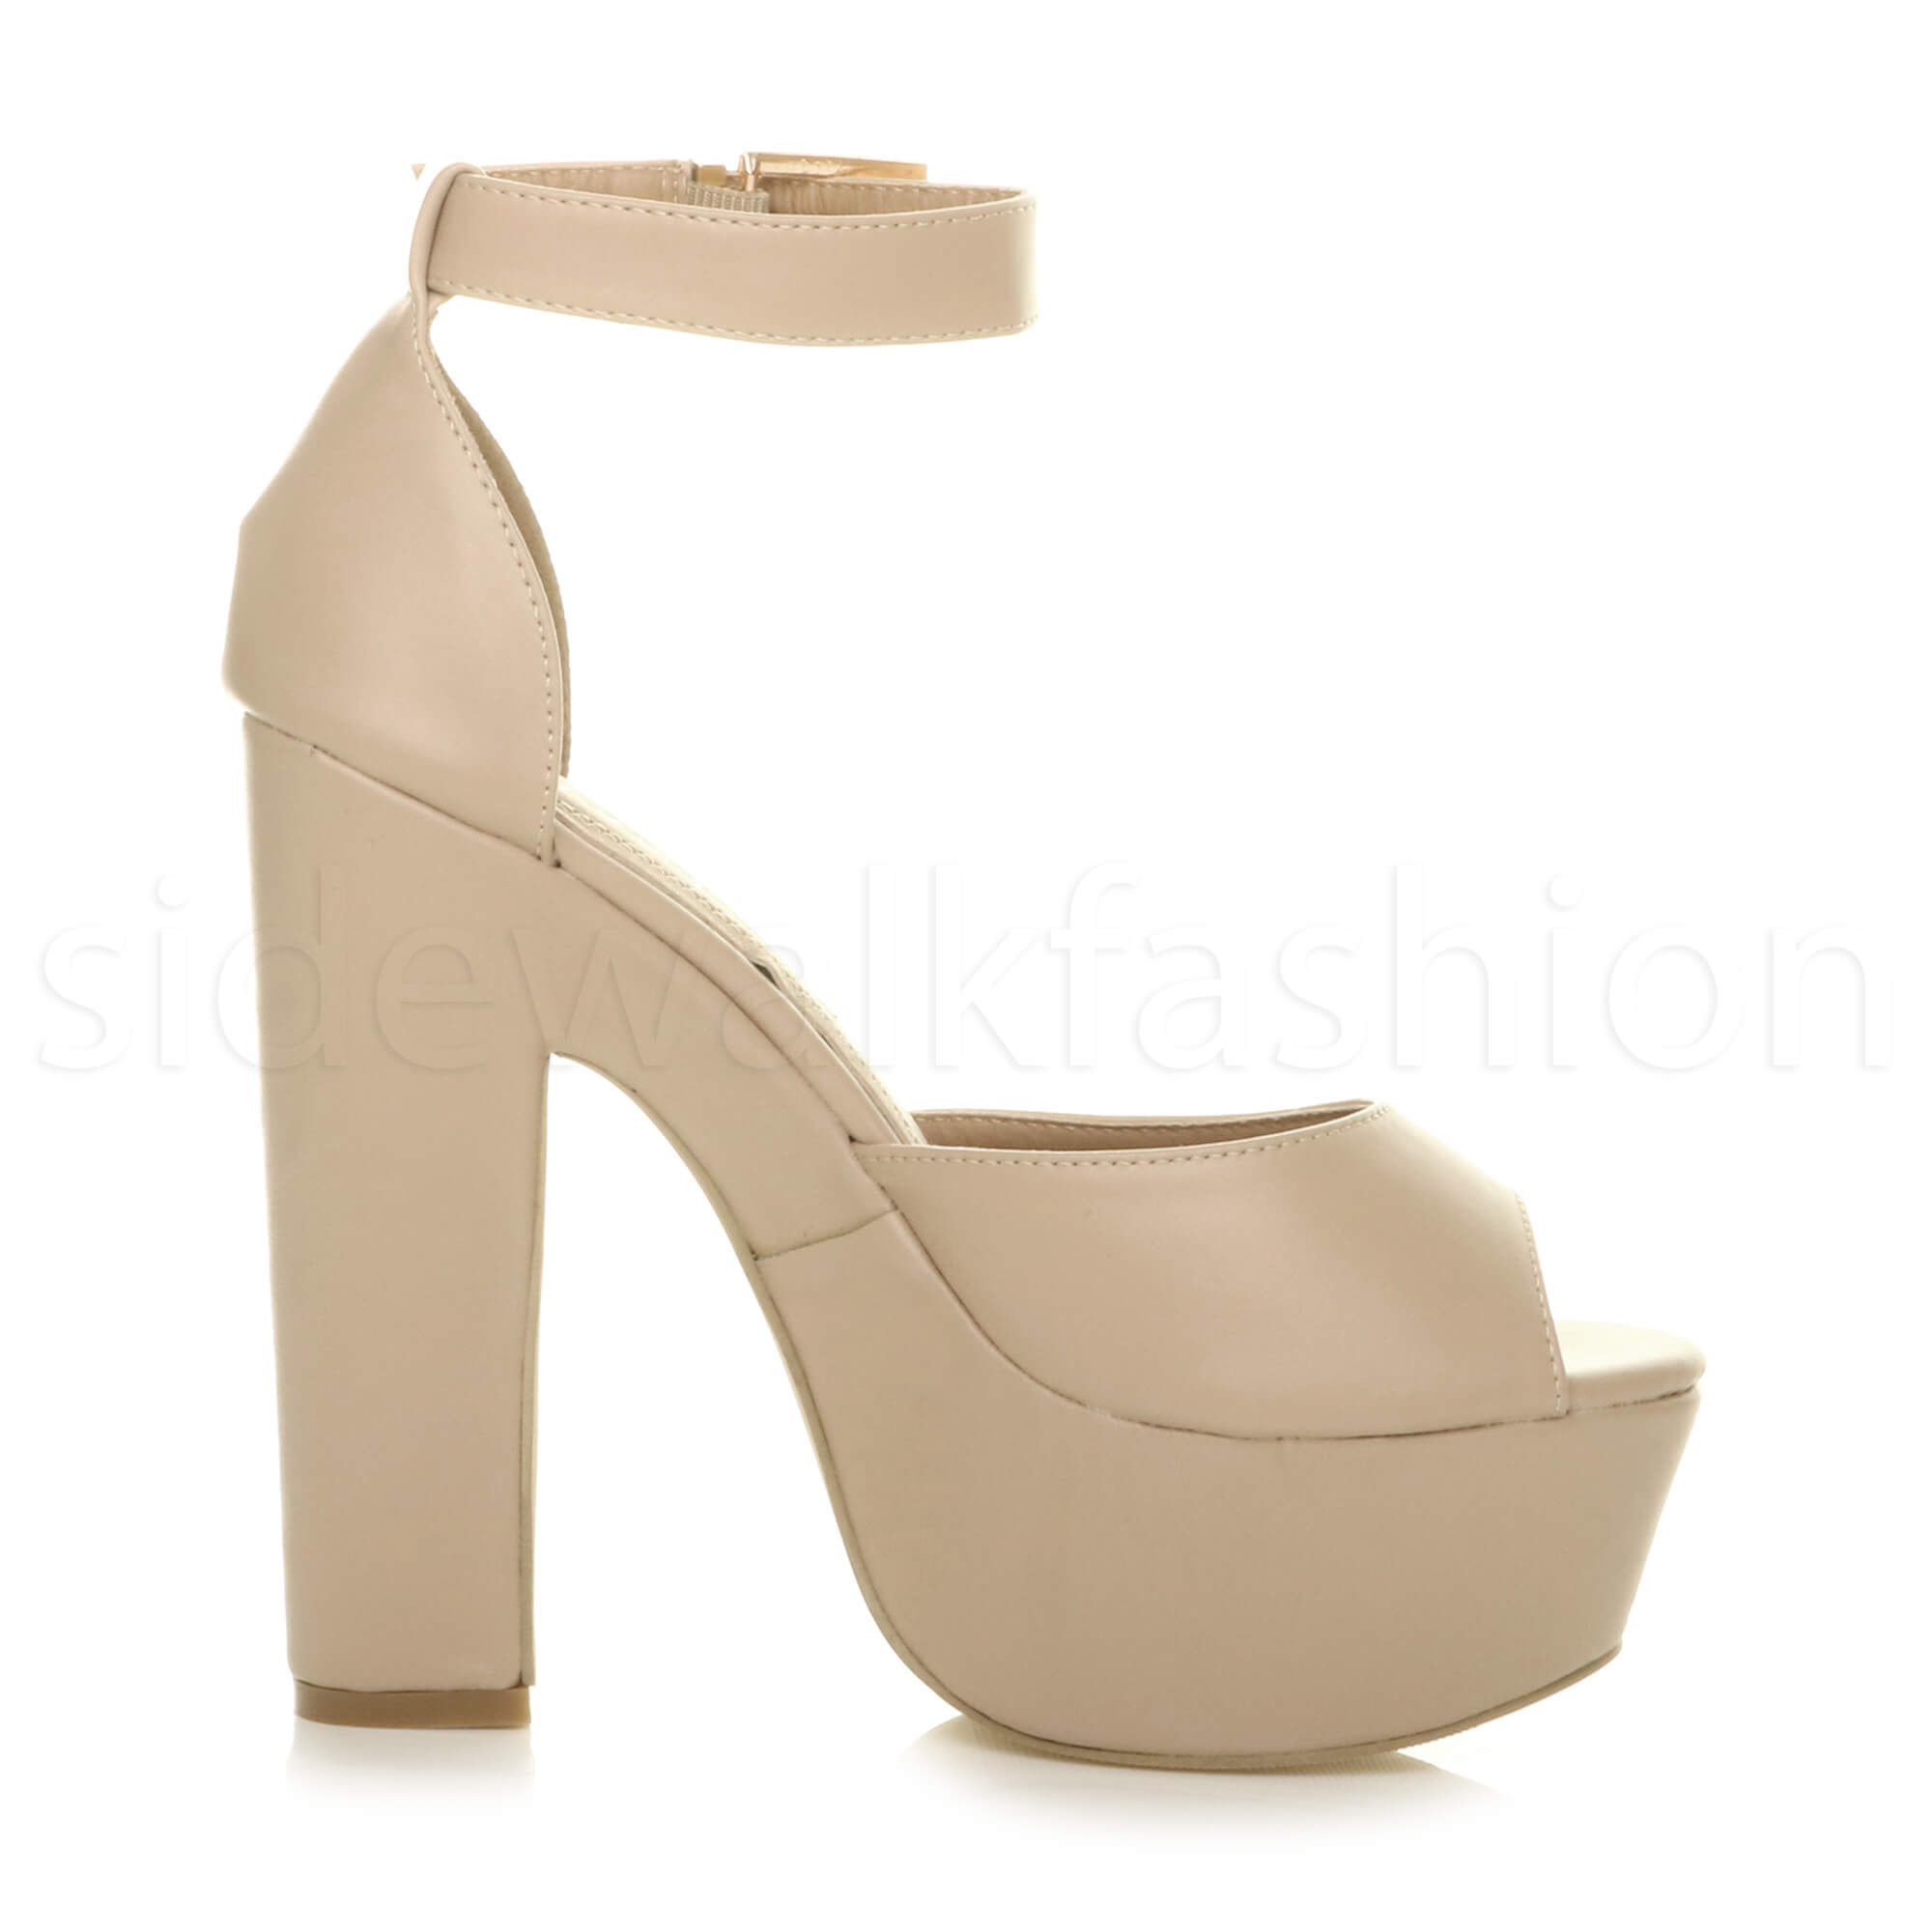 Womens-ladies-high-block-heel-peep-toe-shoes-evening-party-platform-sandals-size thumbnail 19